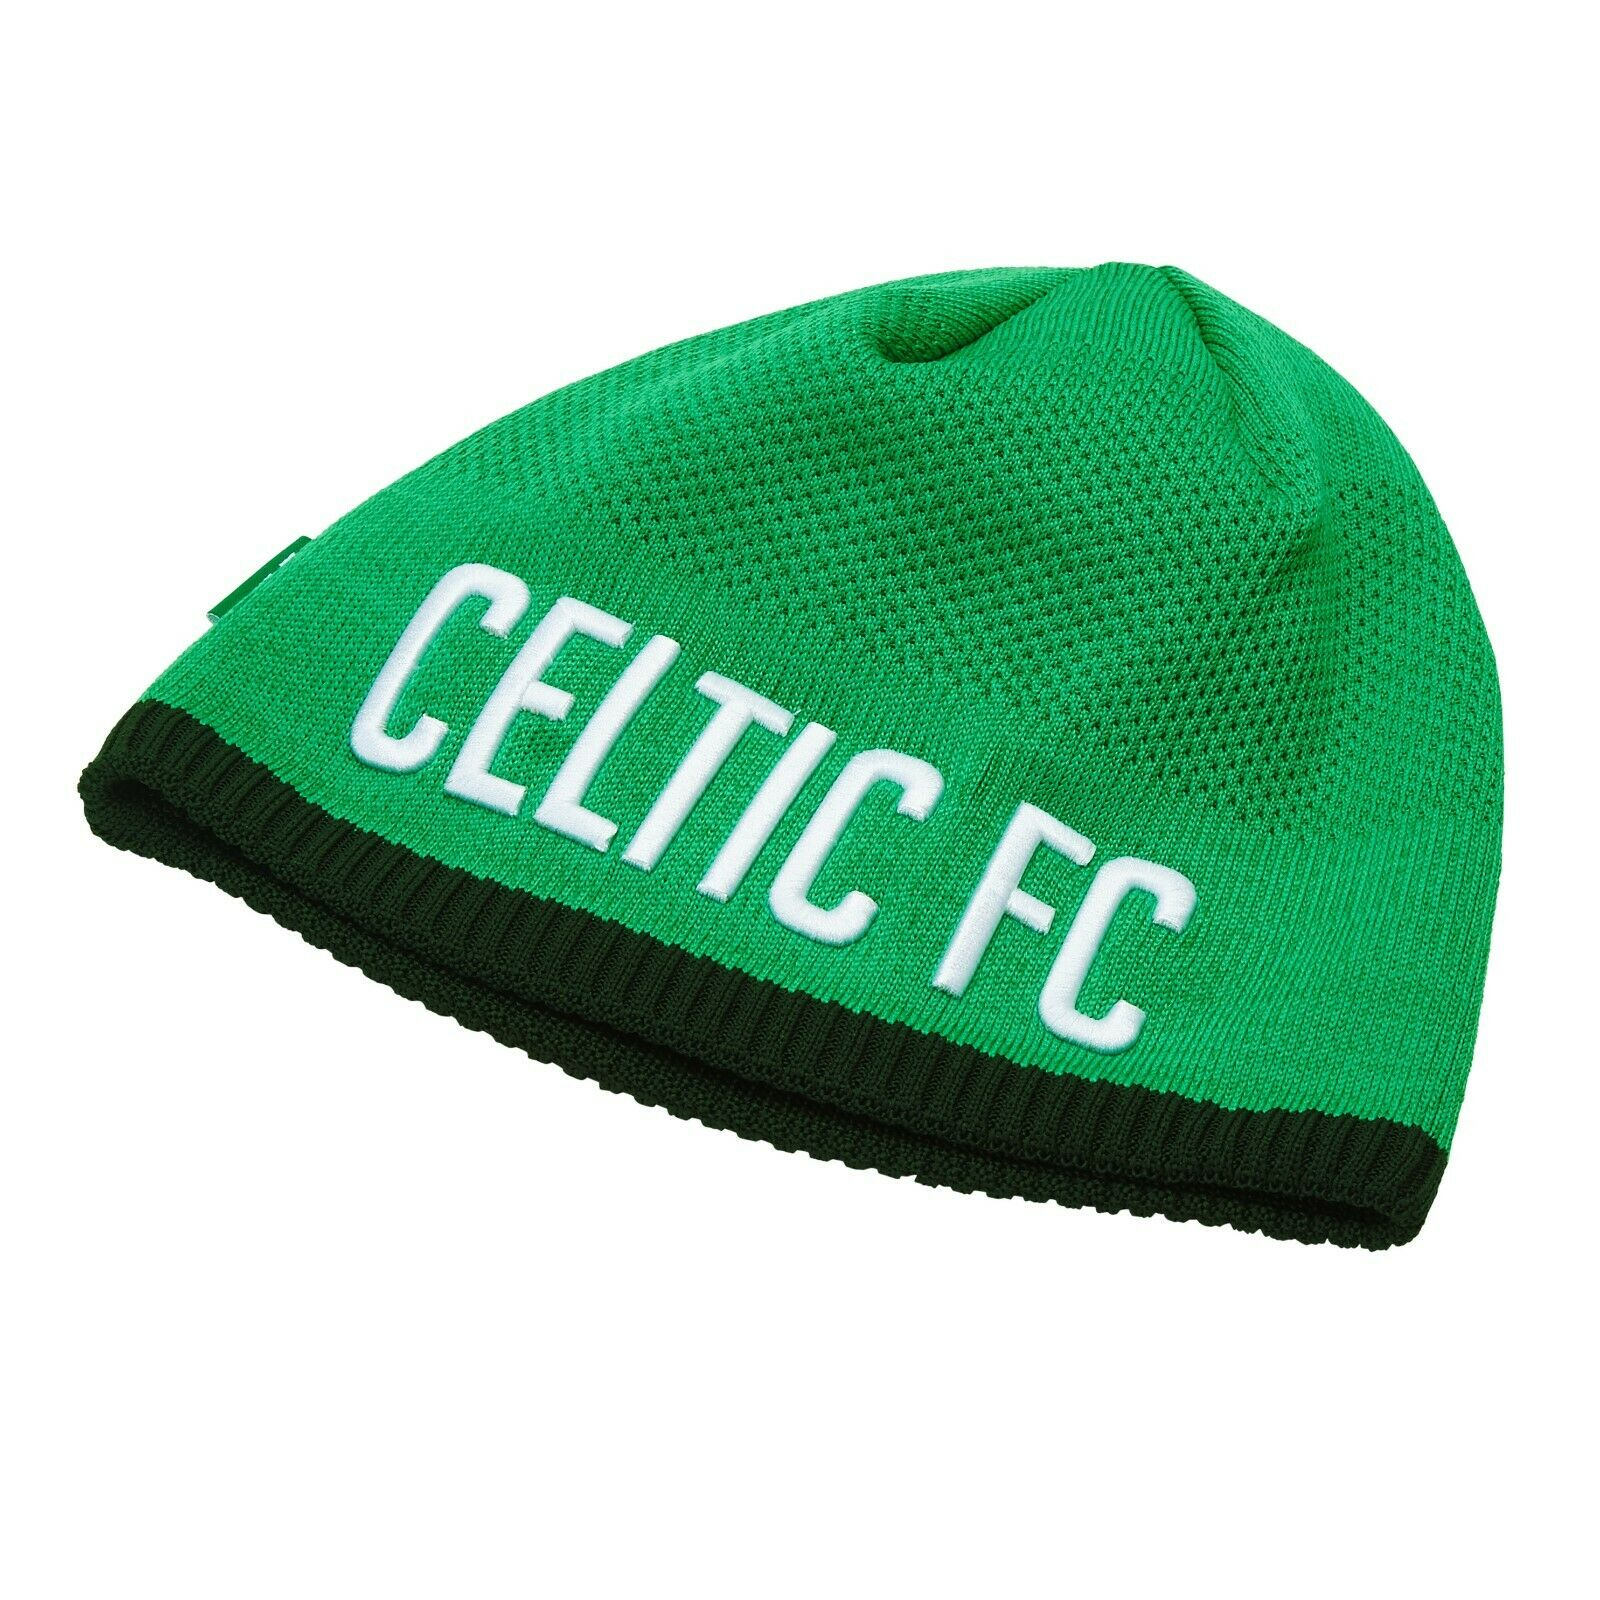 New Balance Celtic FC Season 2018 - 2019 Fotboll Stadium Woolie Beanie grön